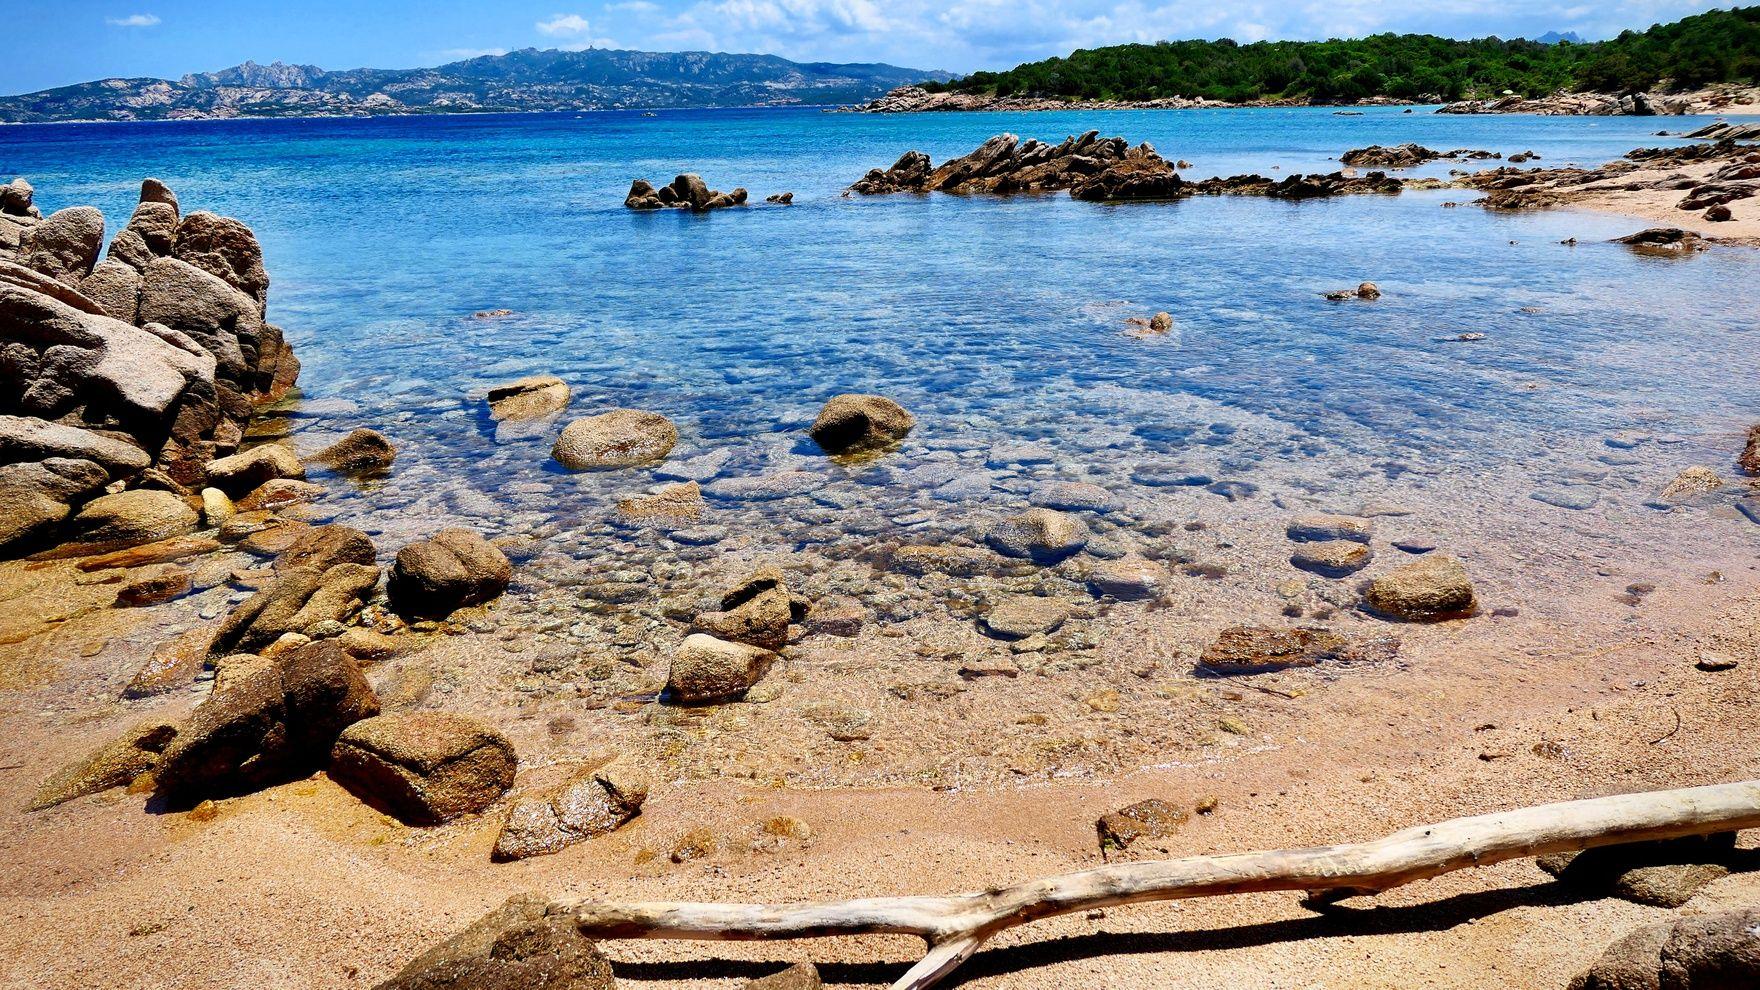 A cruise around Sardinia and Corsica